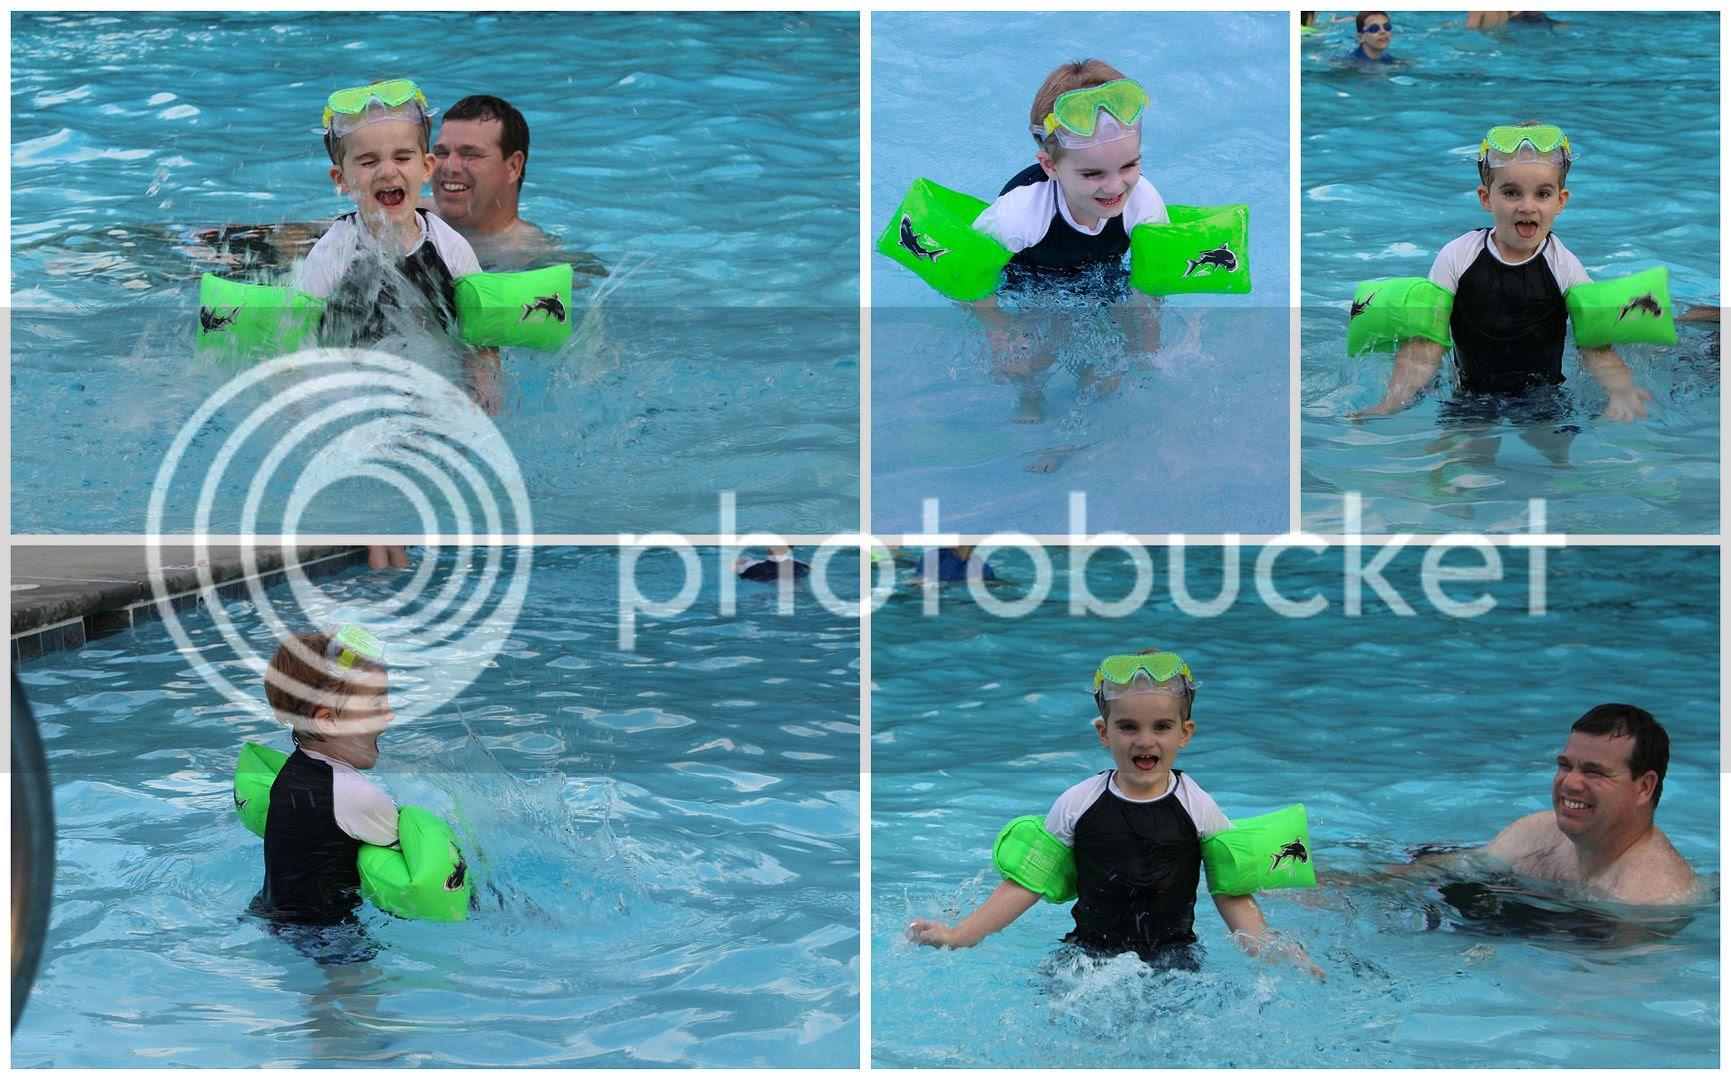 photo pool.collage2_zps9knxzjyi.jpg